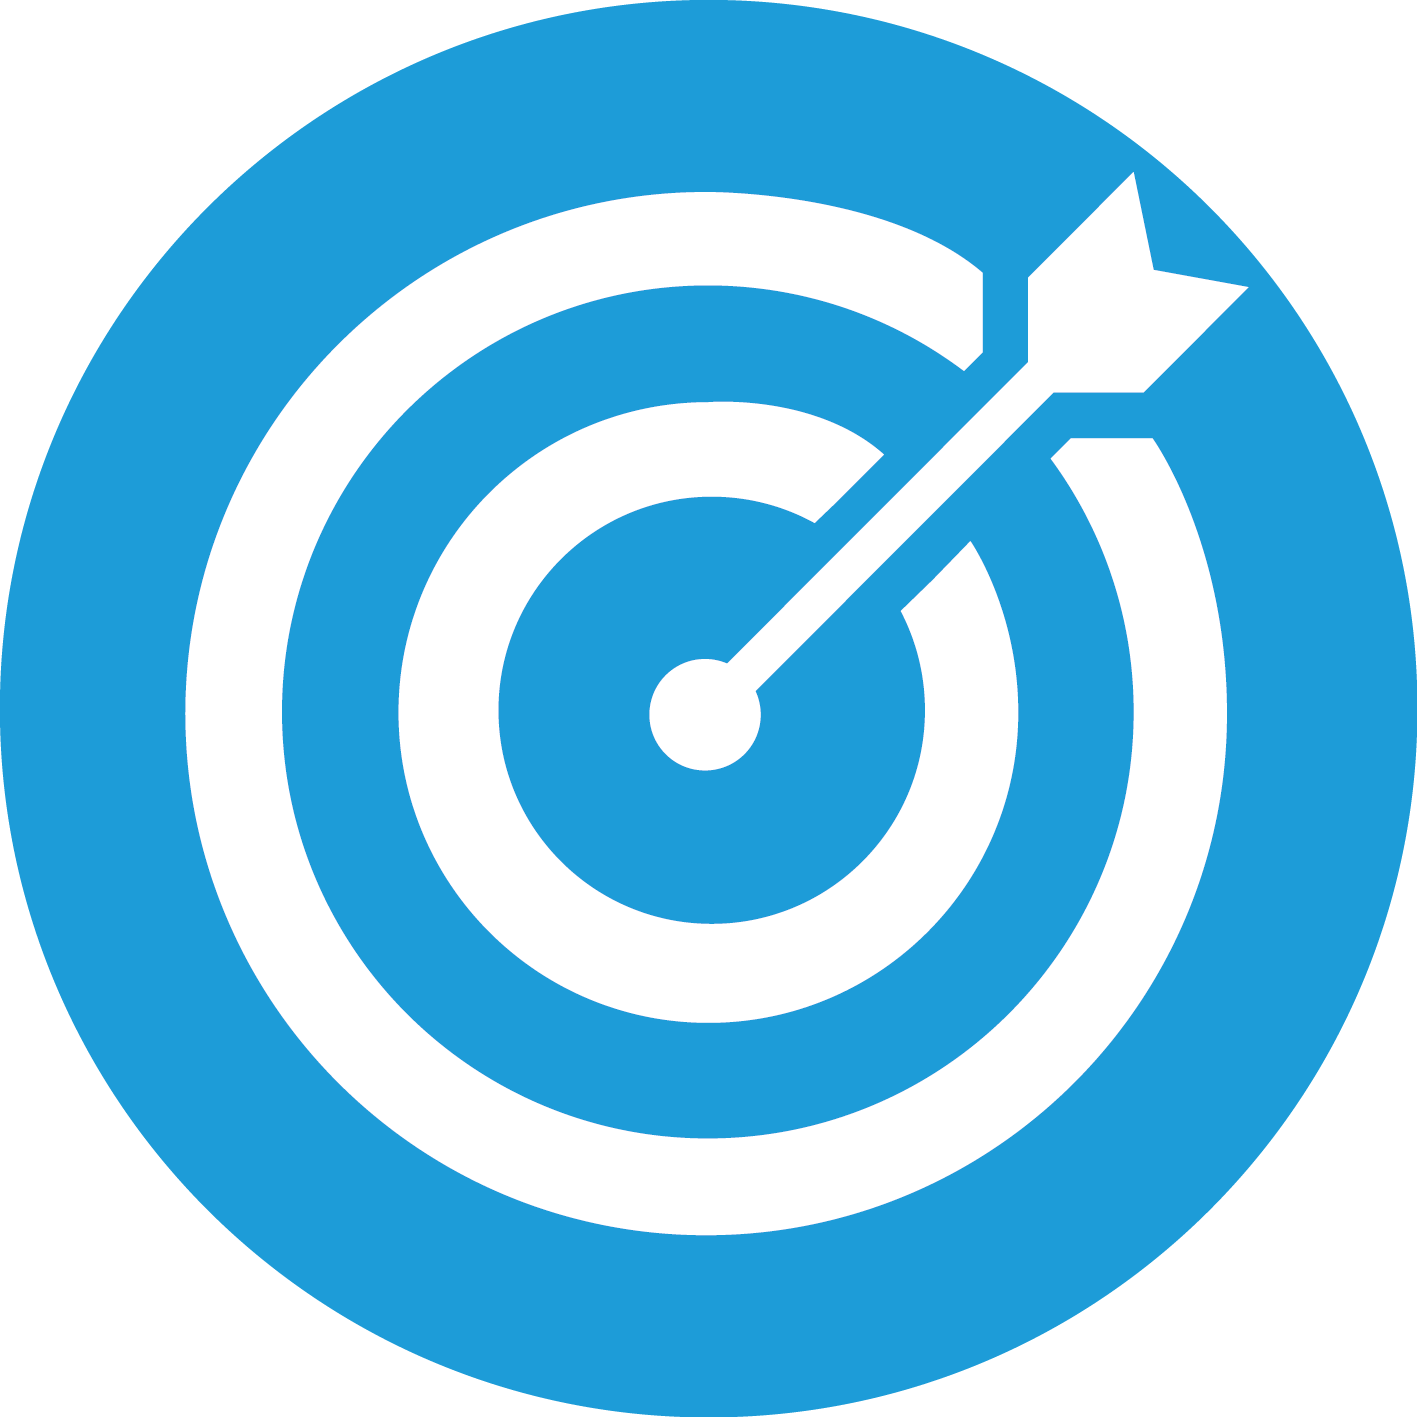 Guaranteed! 5000 Website Visitors - Increase Profits